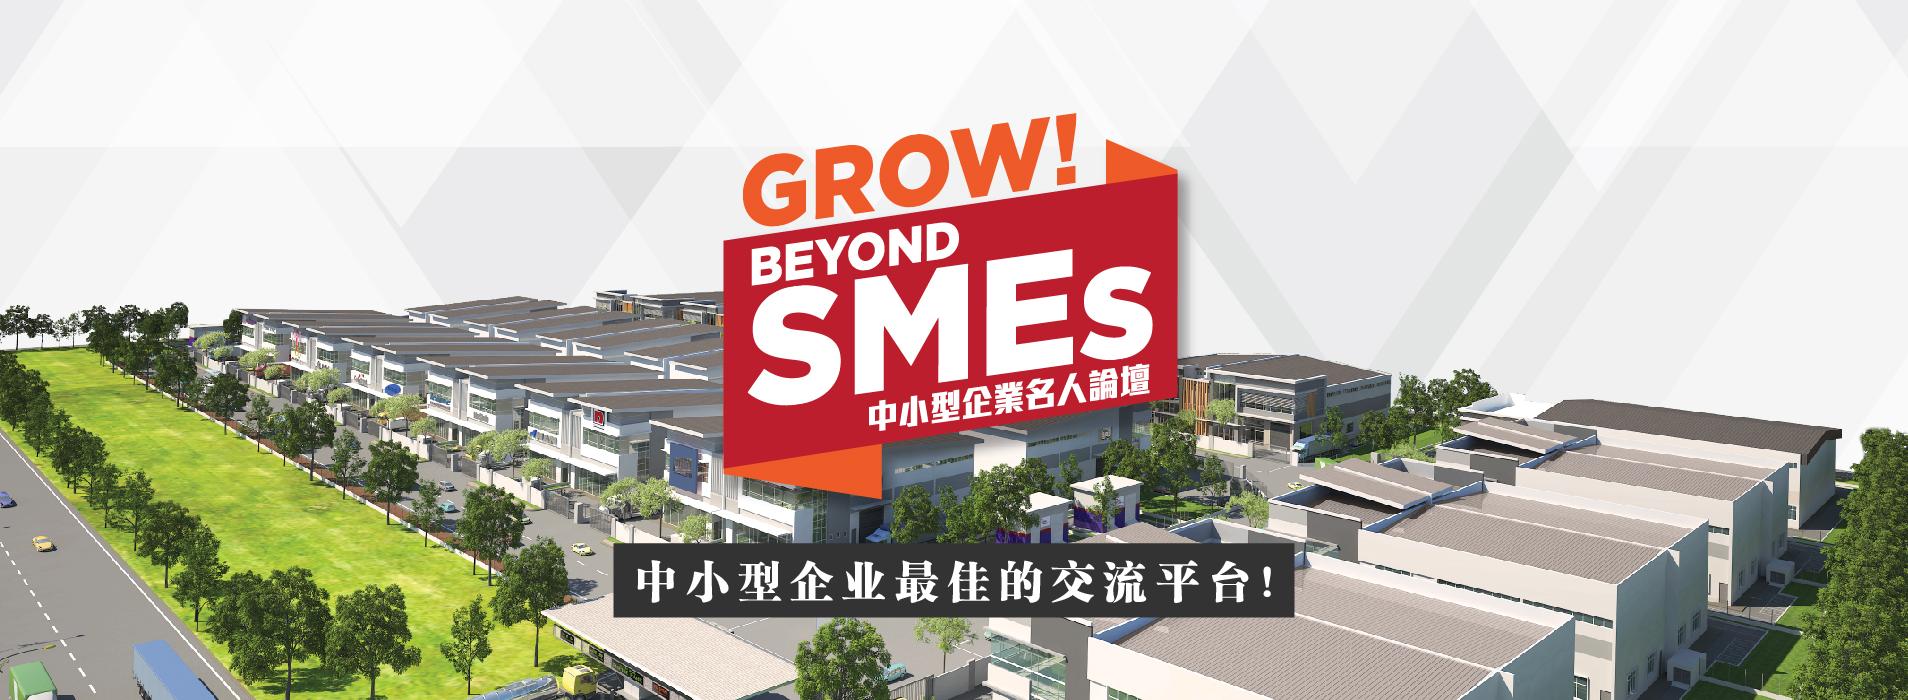 GROW BEYOND SME BN-01